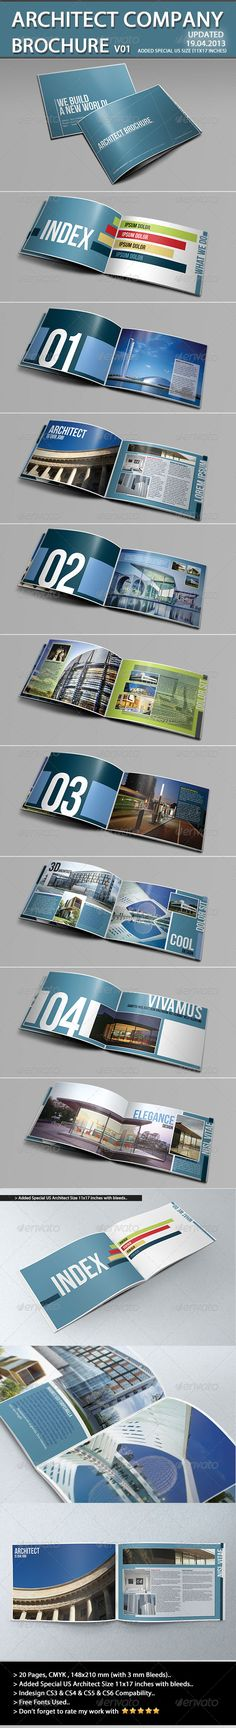 Alpine Travel Brochure Template Travel brochure template, Travel - tourist brochure template